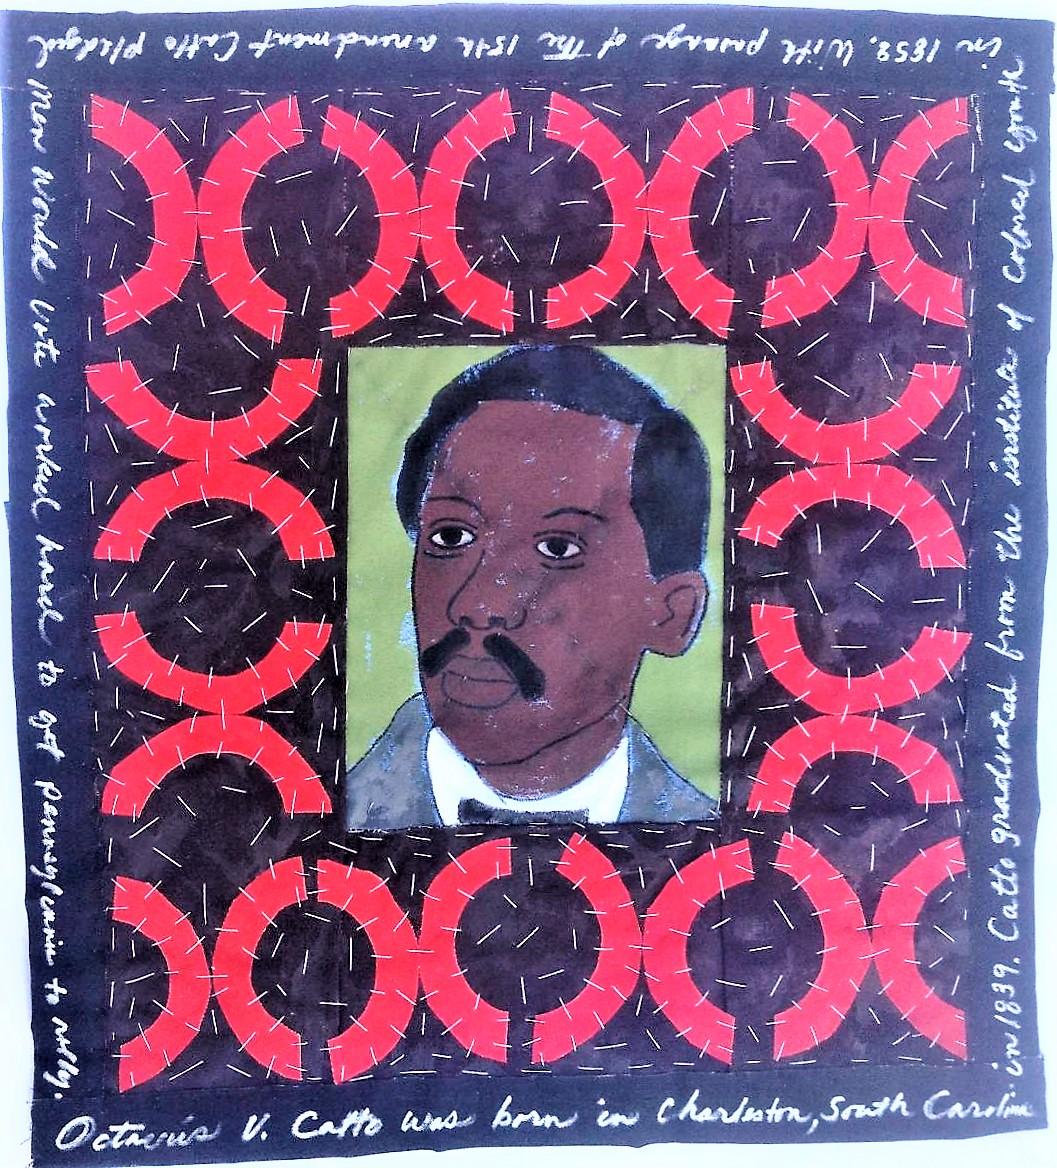 Octavius Valentine Catto was a black educator, intellectual, and civil rights activist in Philadelphia. -